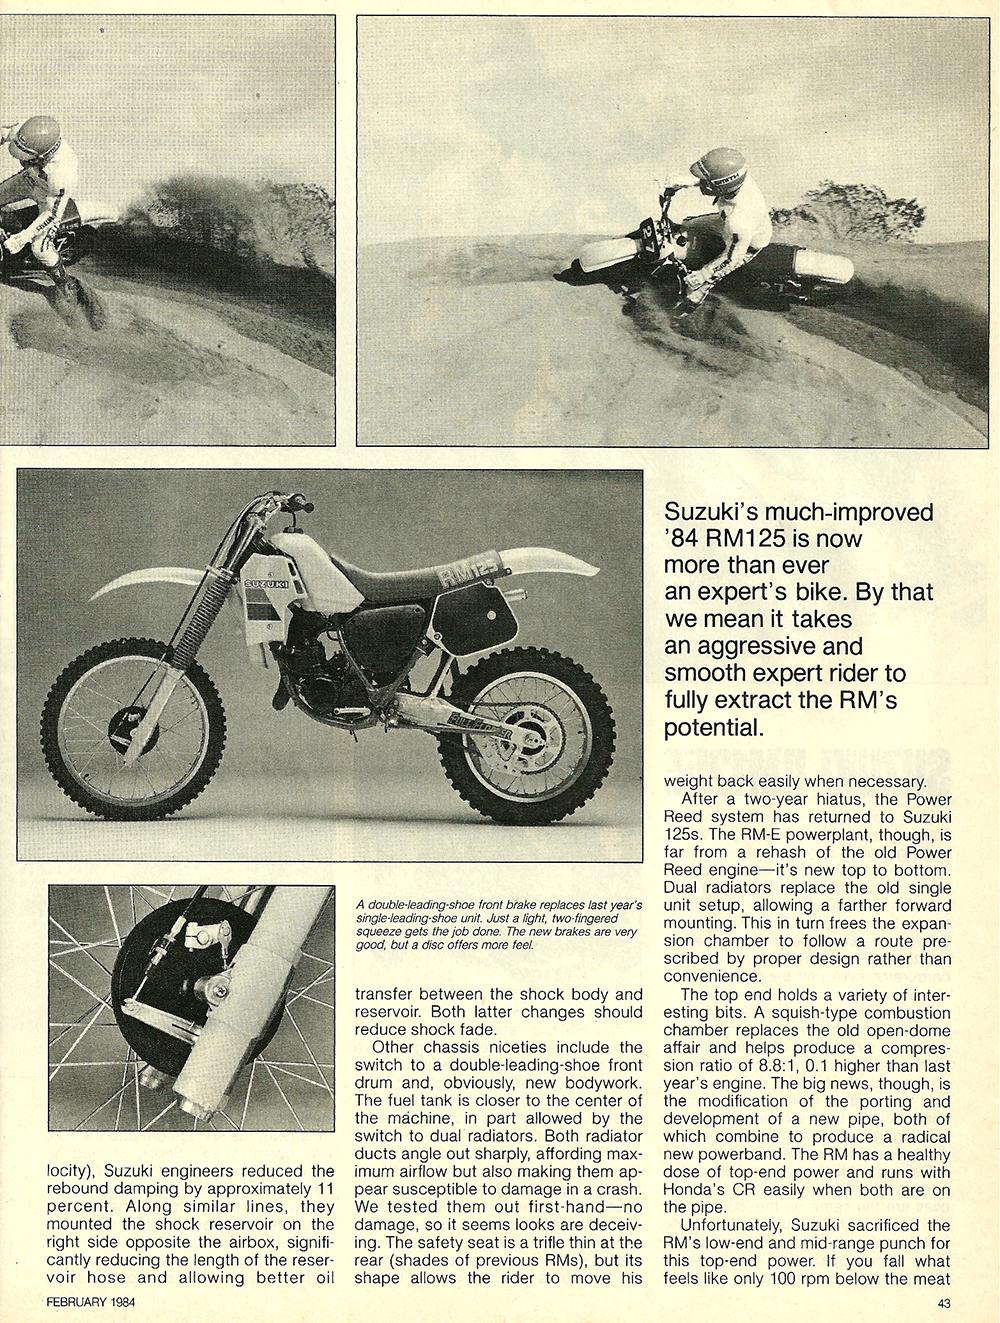 1984 Suzuki RM125E road test 4.jpg